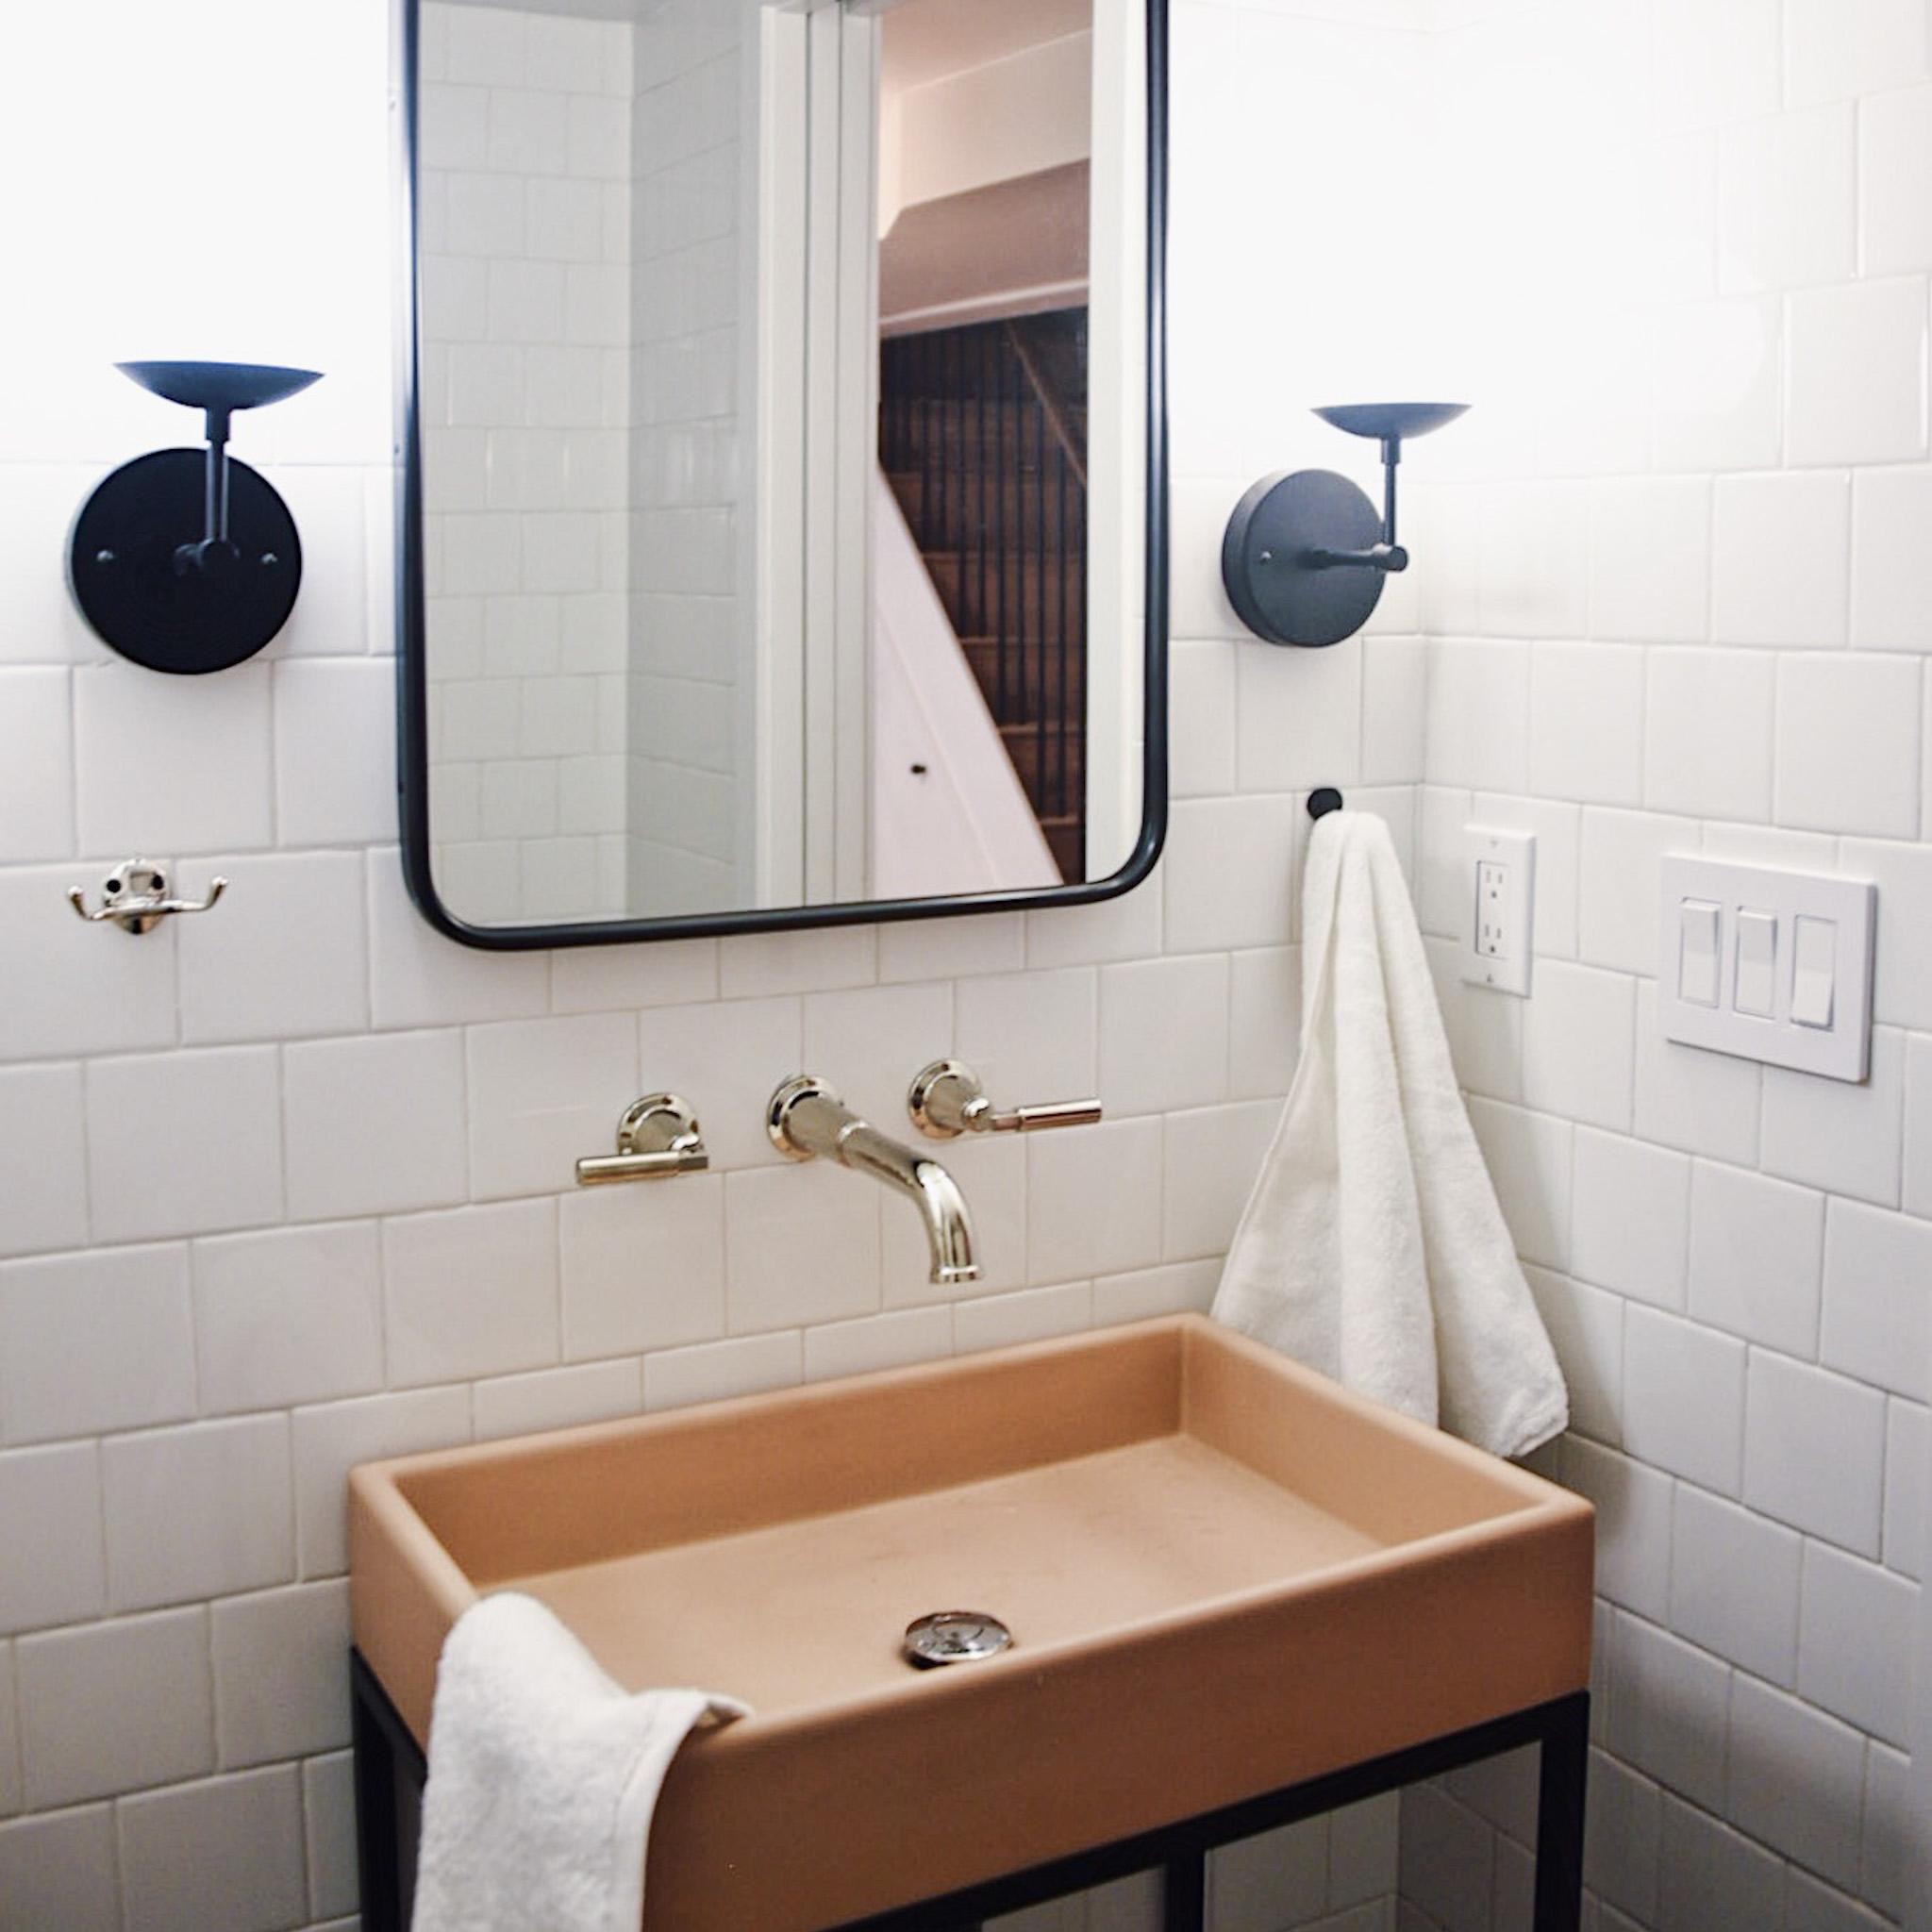 Turntable Kitchen Bathroom Renovation